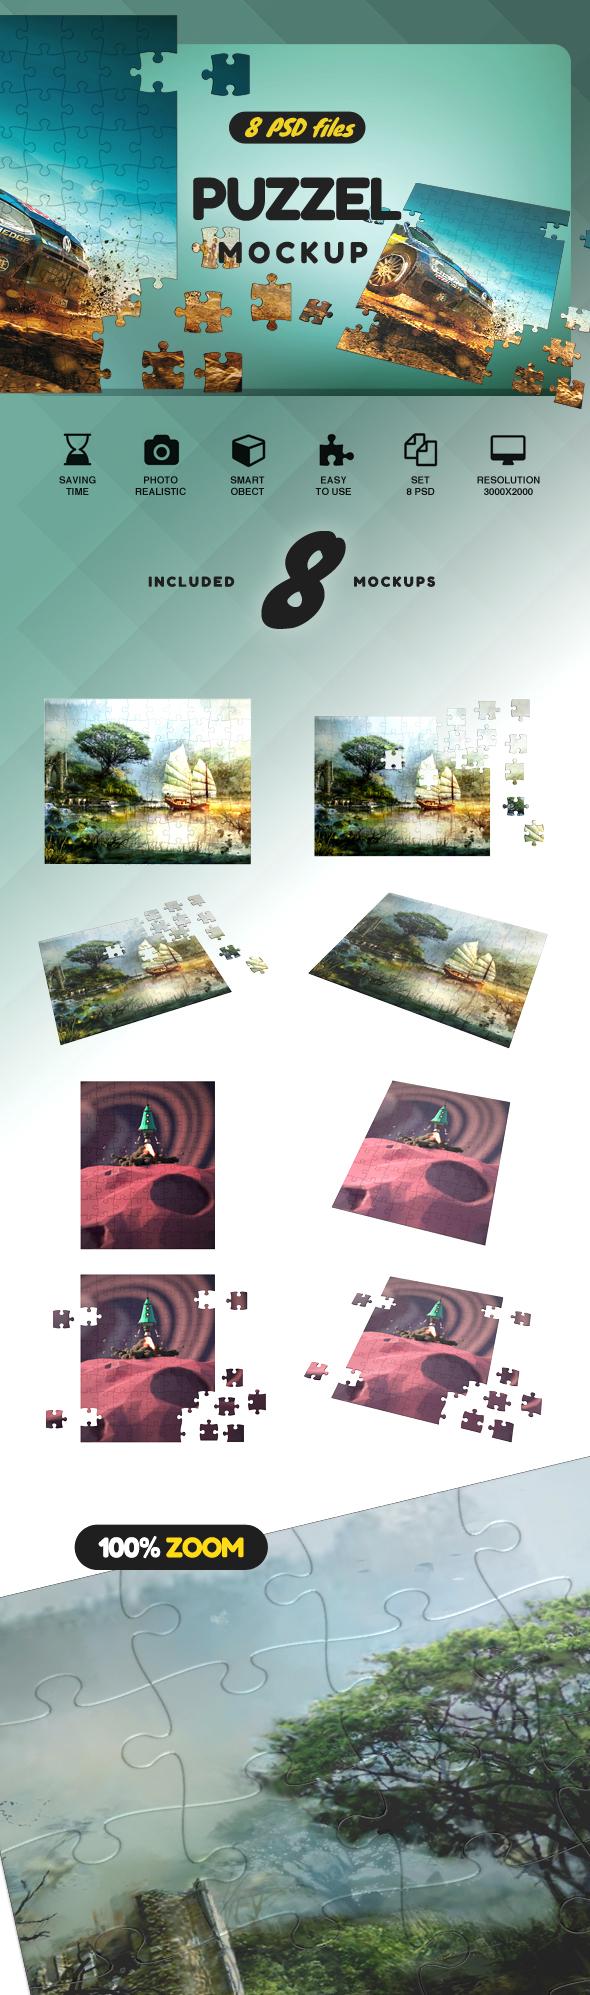 Puzzel Mockup example image 2